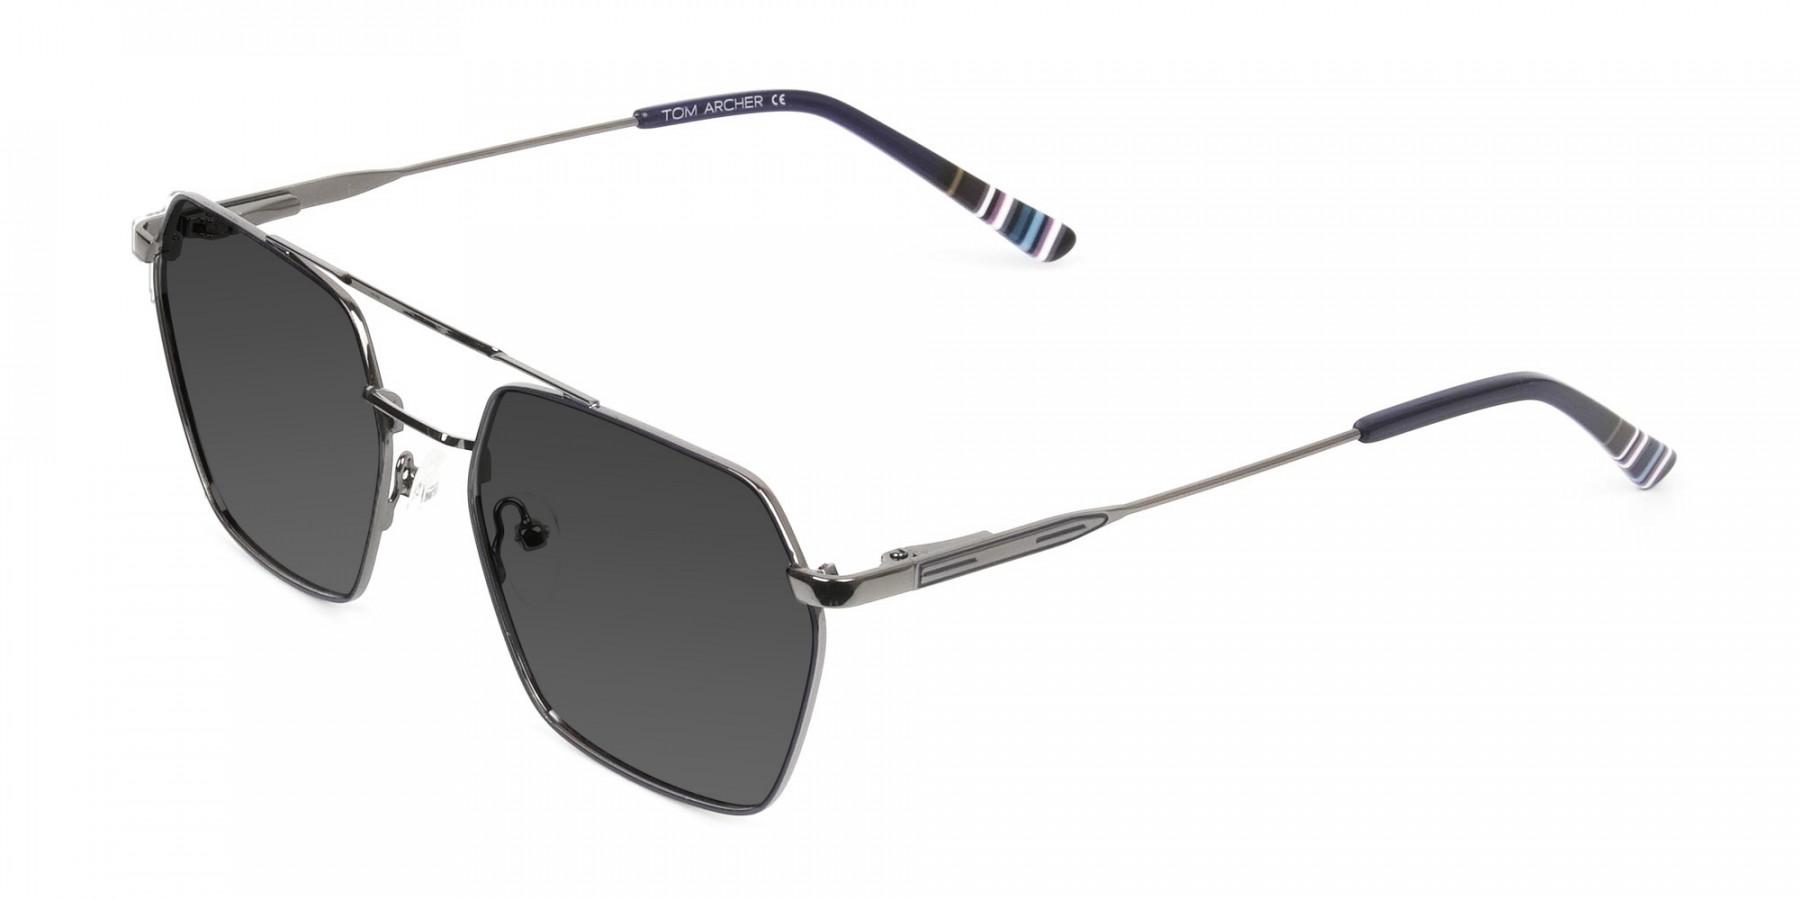 dark-navy-gunmetal-grey tinted-thin-frame-sunglasses-3